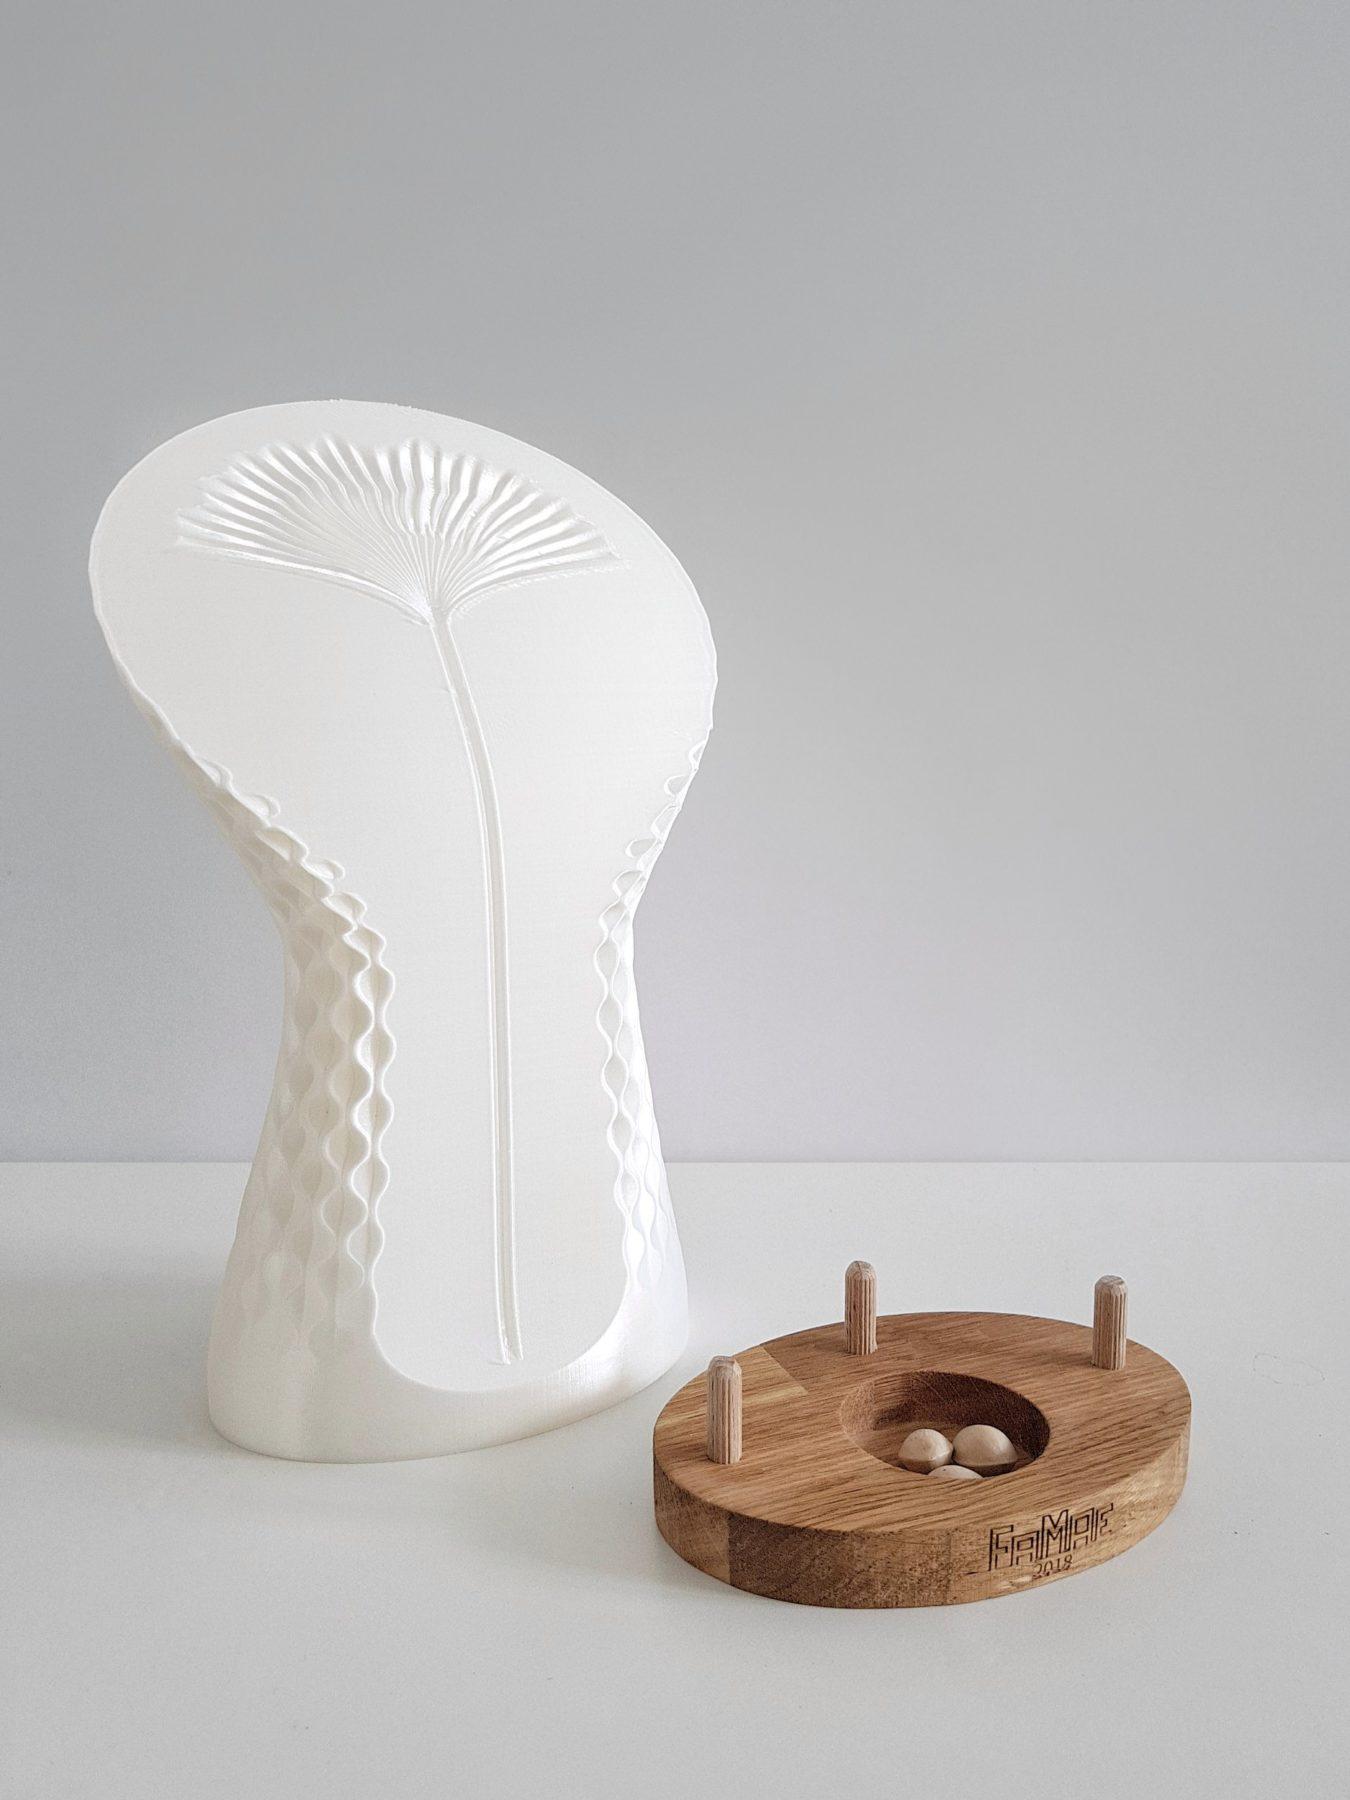 Trophées - Fondation FAMAE - www.bold-design.fr